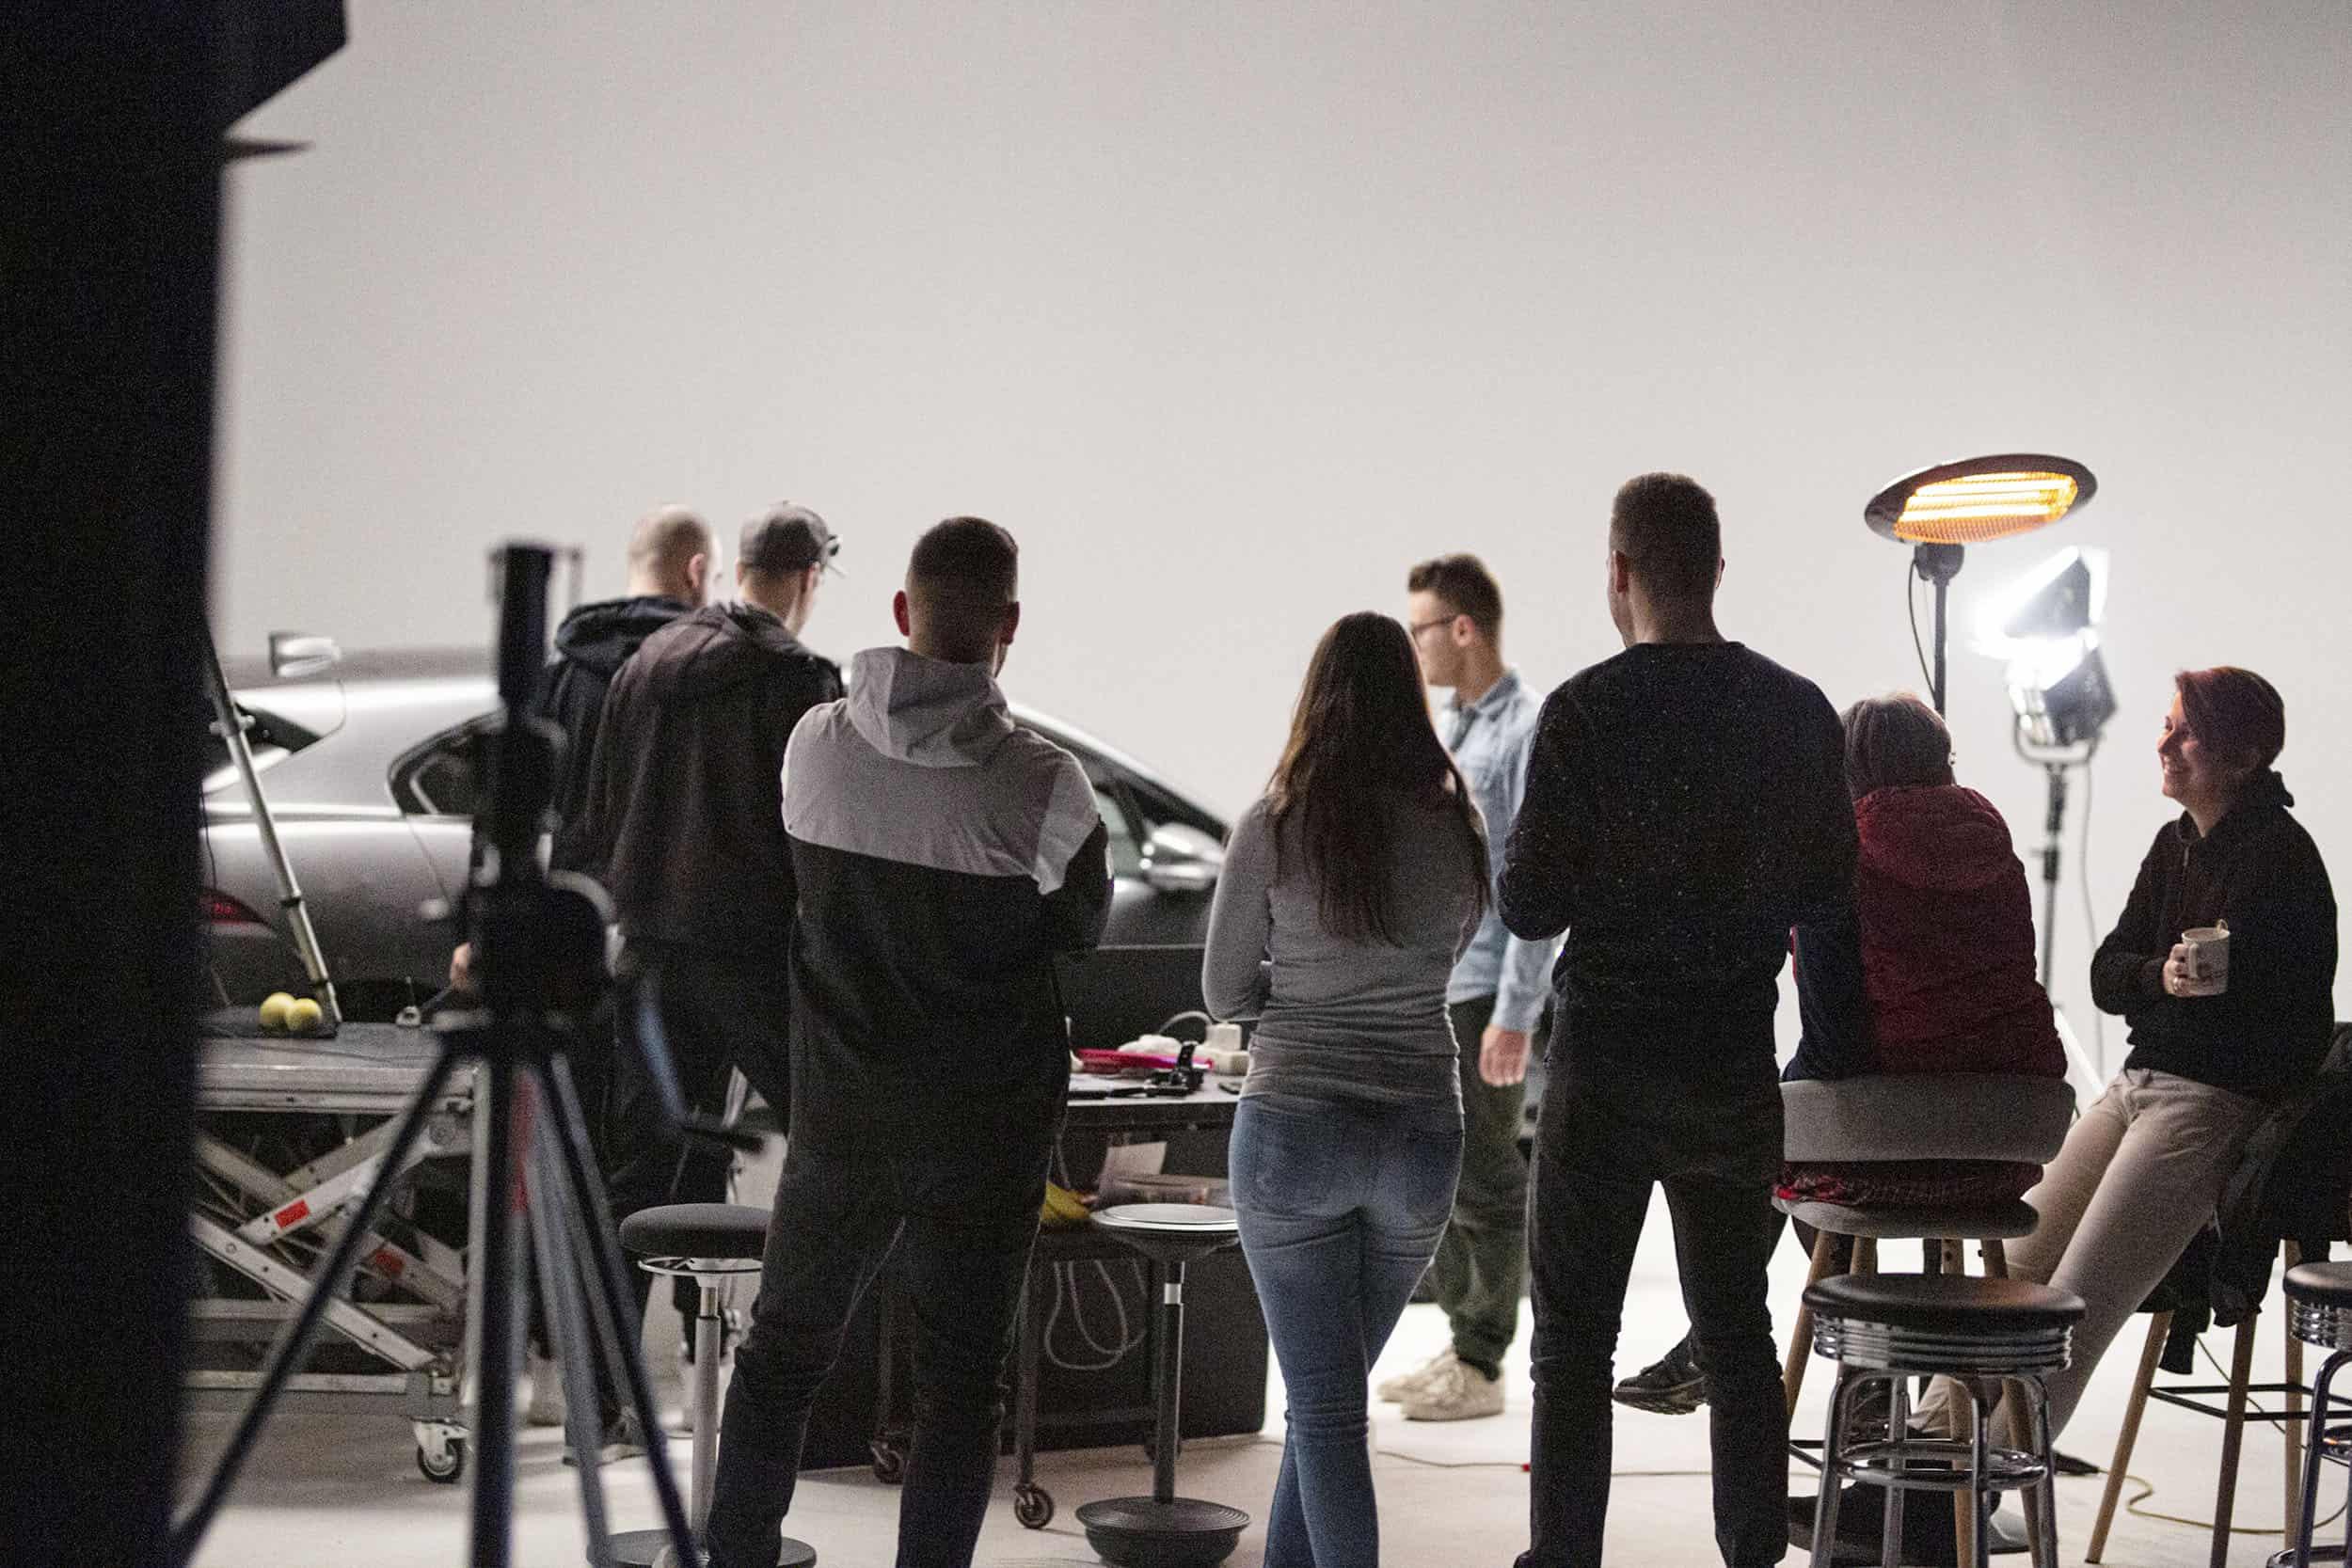 studio-ignatov-wkw-automotive-imagekampagne-makingof-09